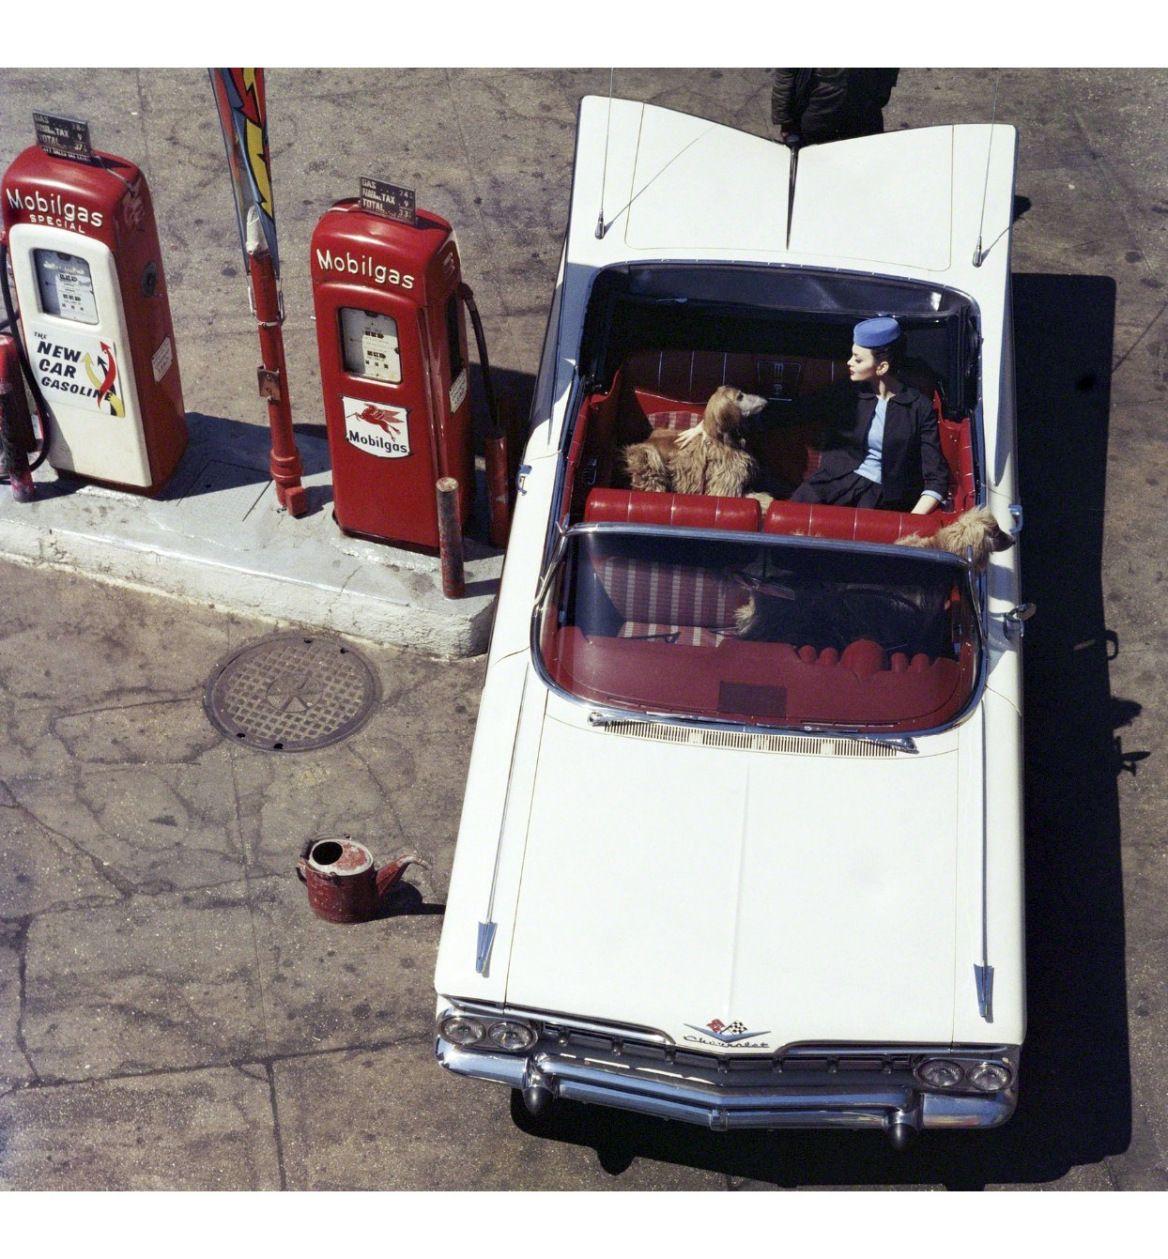 Isabella Albonico Chevrolet Impala Gas Pumps 6th Avenue New